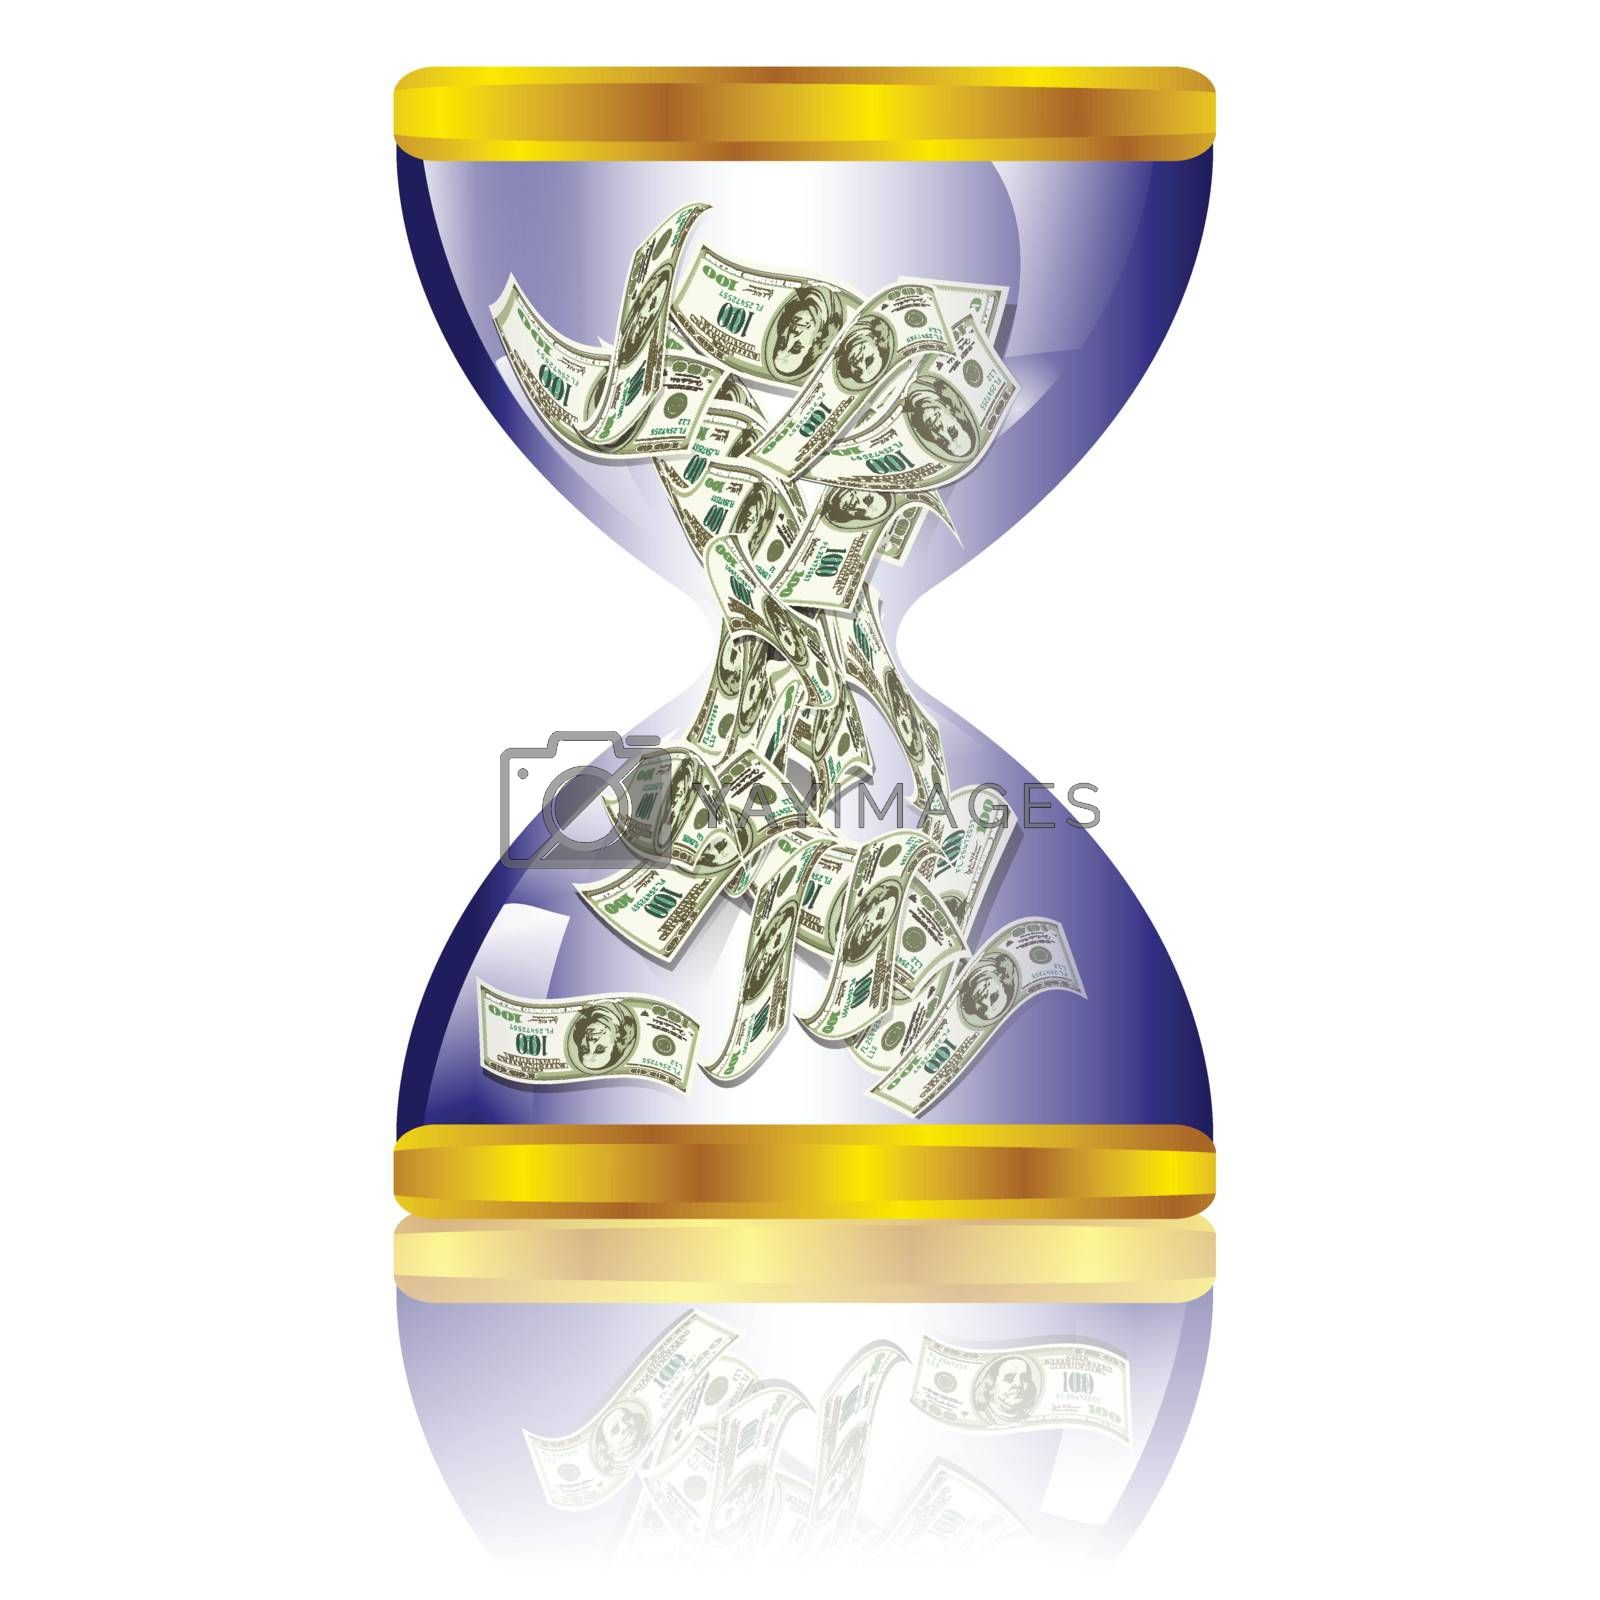 Dollar bills stuffed in hourglass